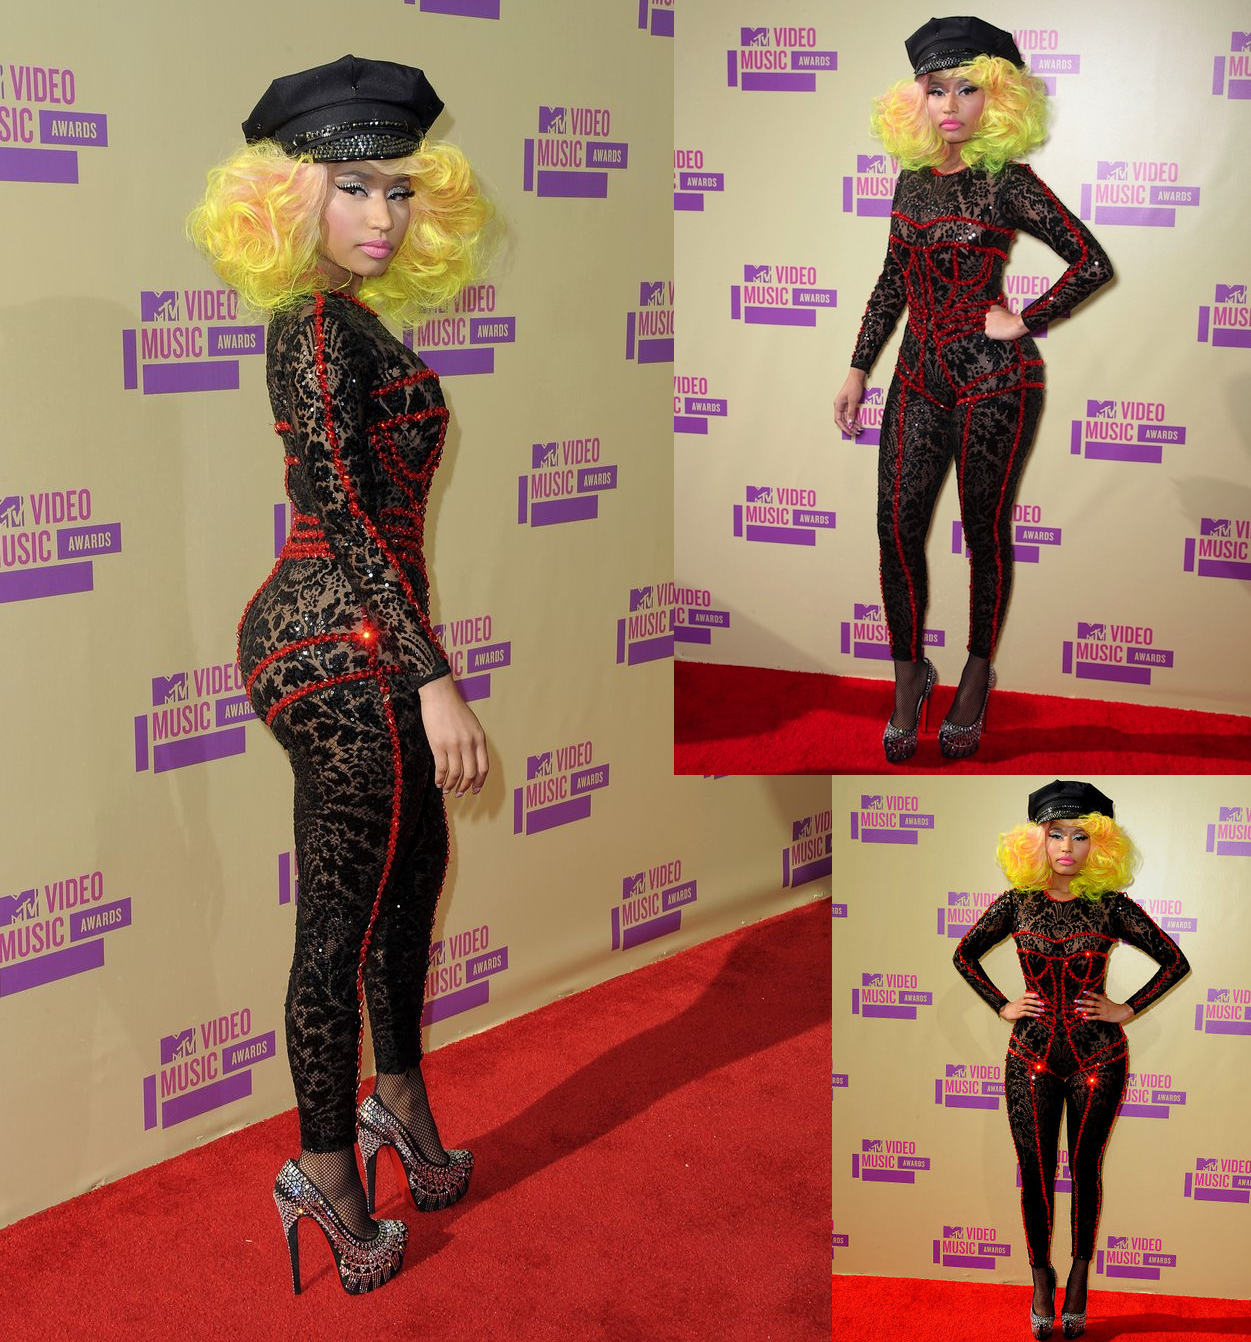 The rest is still unwritten: MTV Video Music Awards 2012